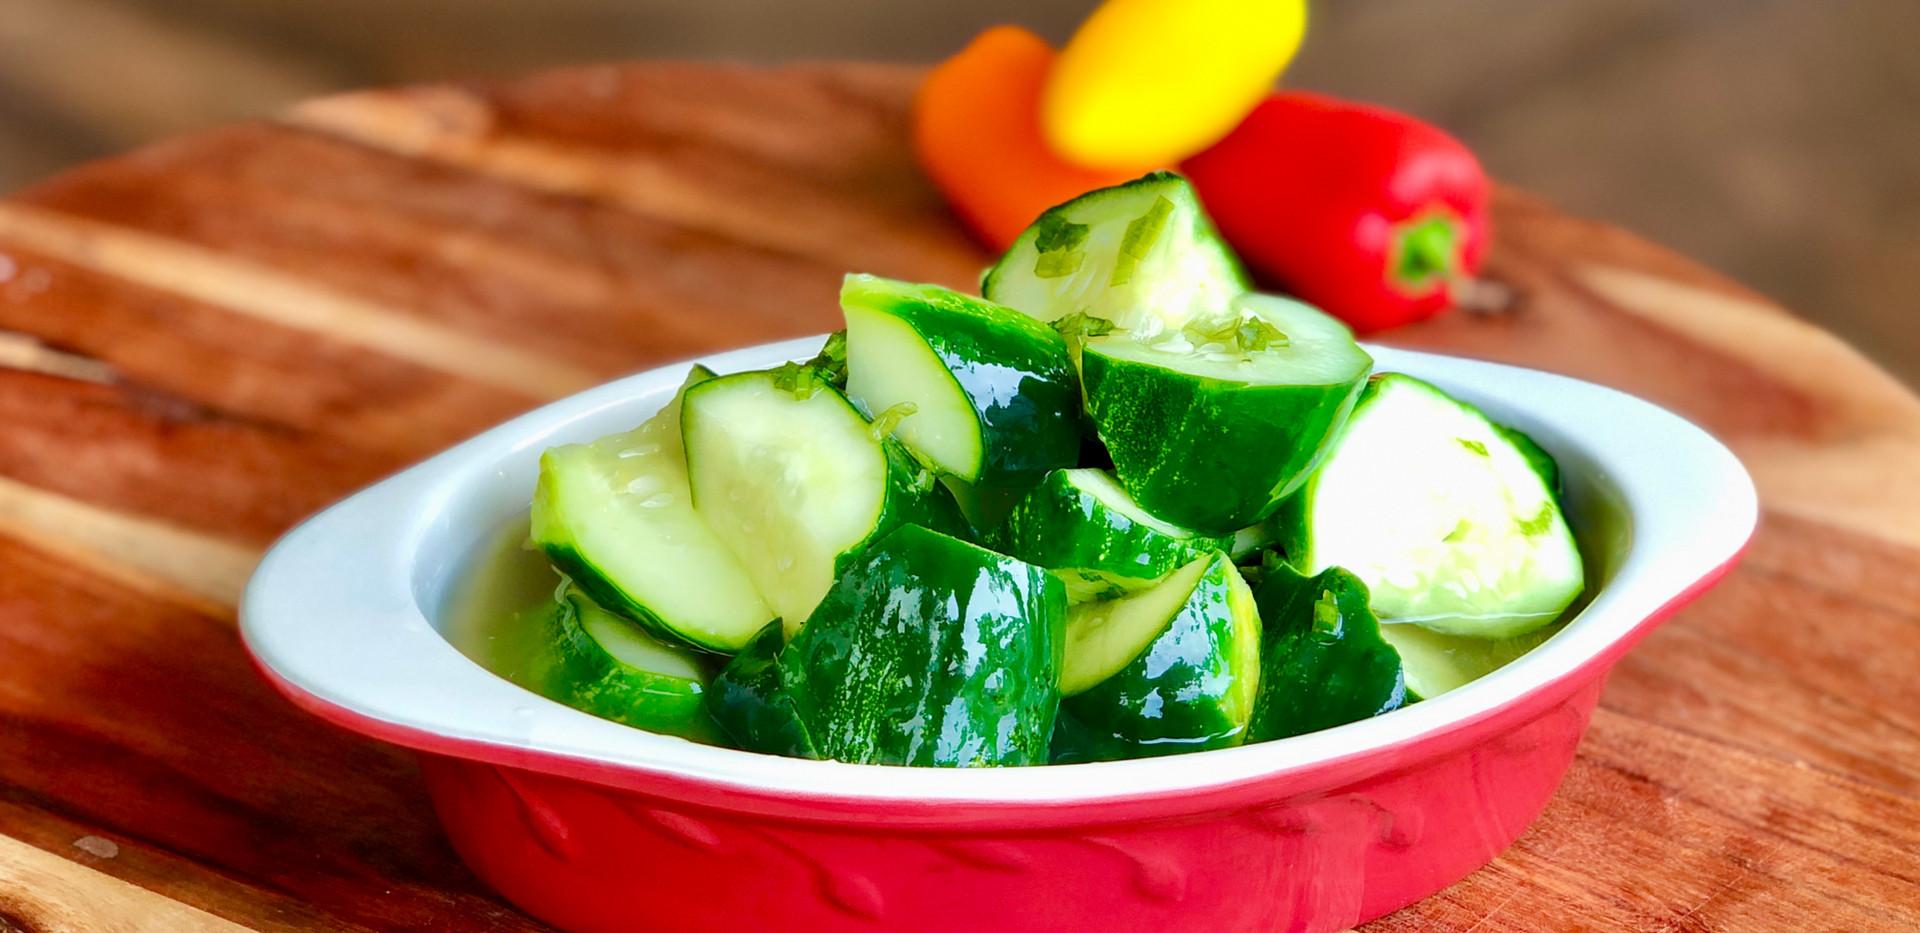 Korean Cucumber Side Dish/BanChan/Pickle/Salad (오이반찬 Oi Muchim 오이무침) EASY VEGAN Recipe